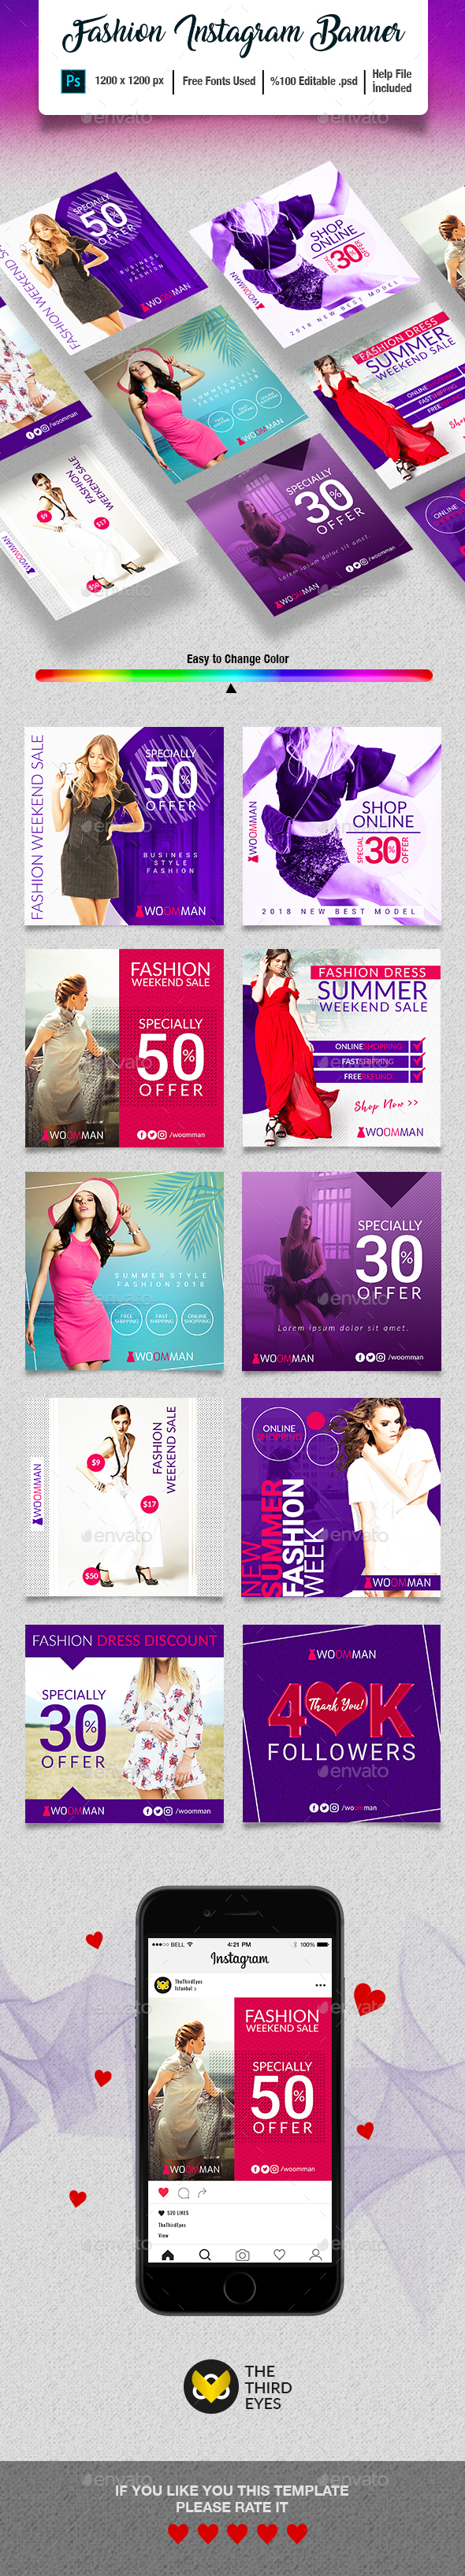 Fashion Instagram Banner - Social Media Web Elements